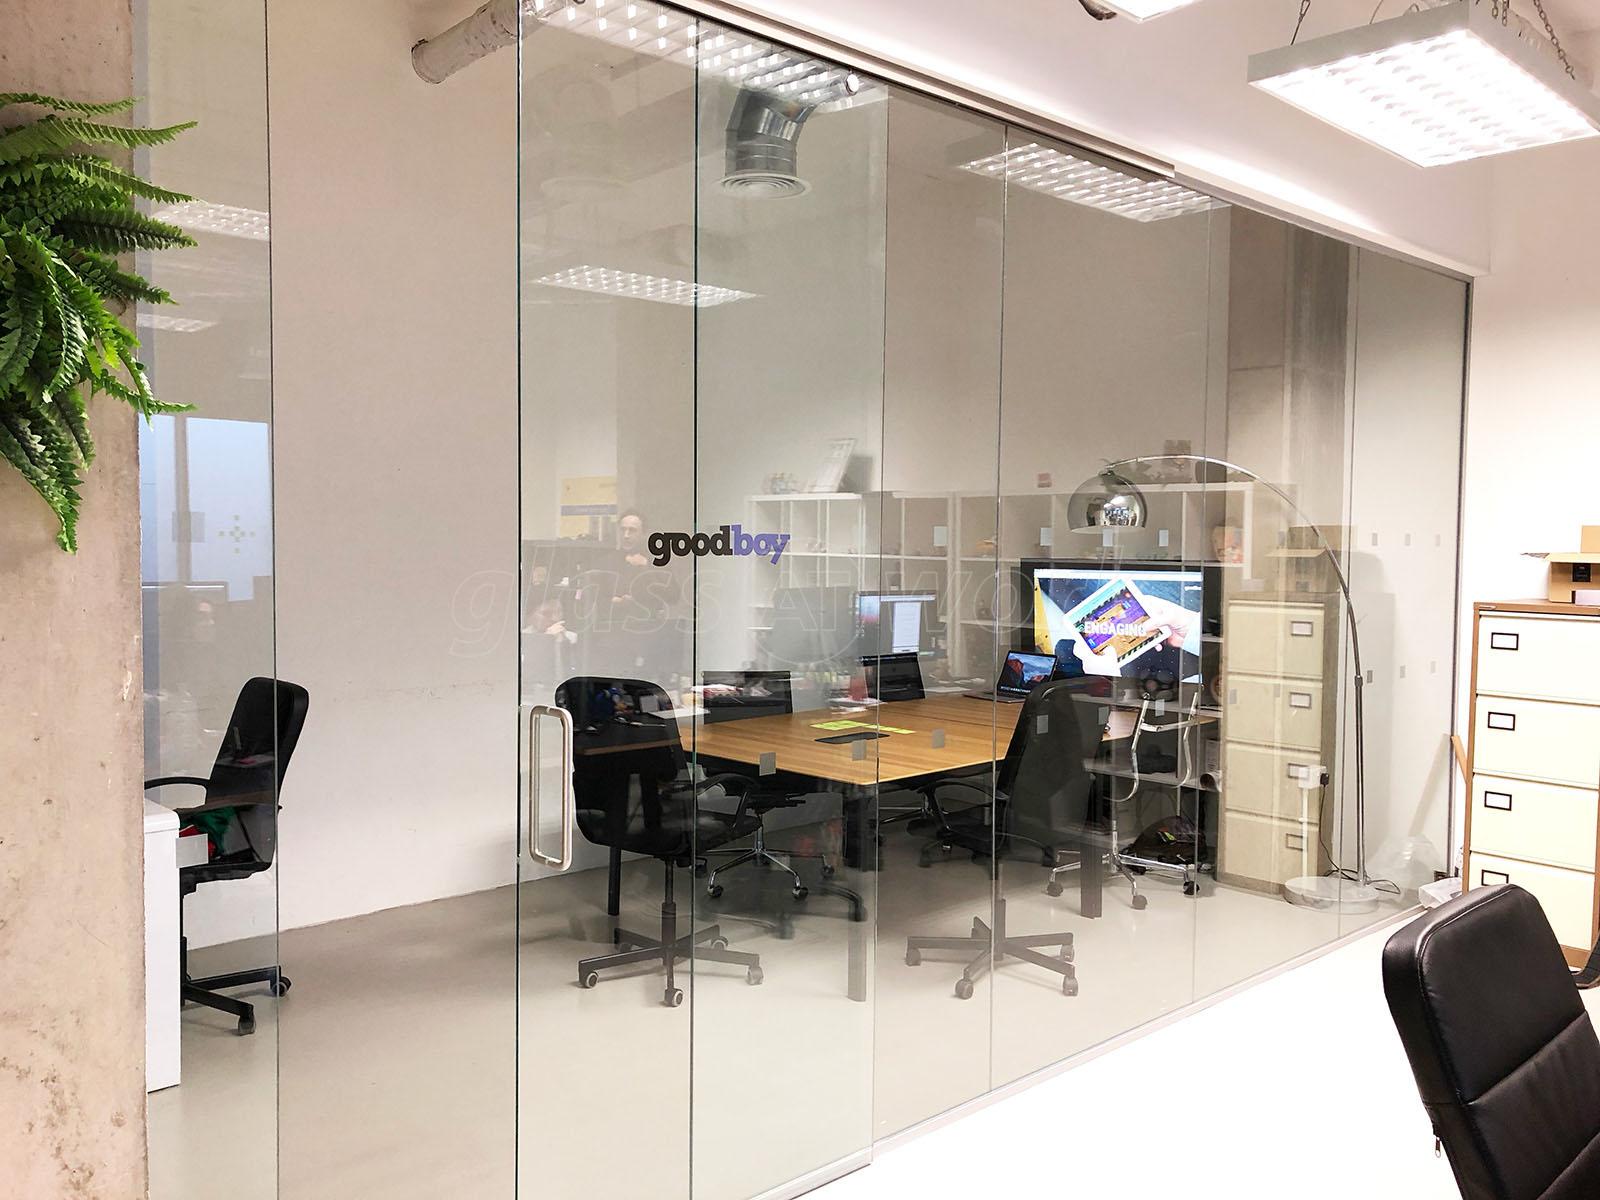 office sliding door. Goodboy Digital Ltd (London): Top Hung Glass Sliding Door And Office Partition S